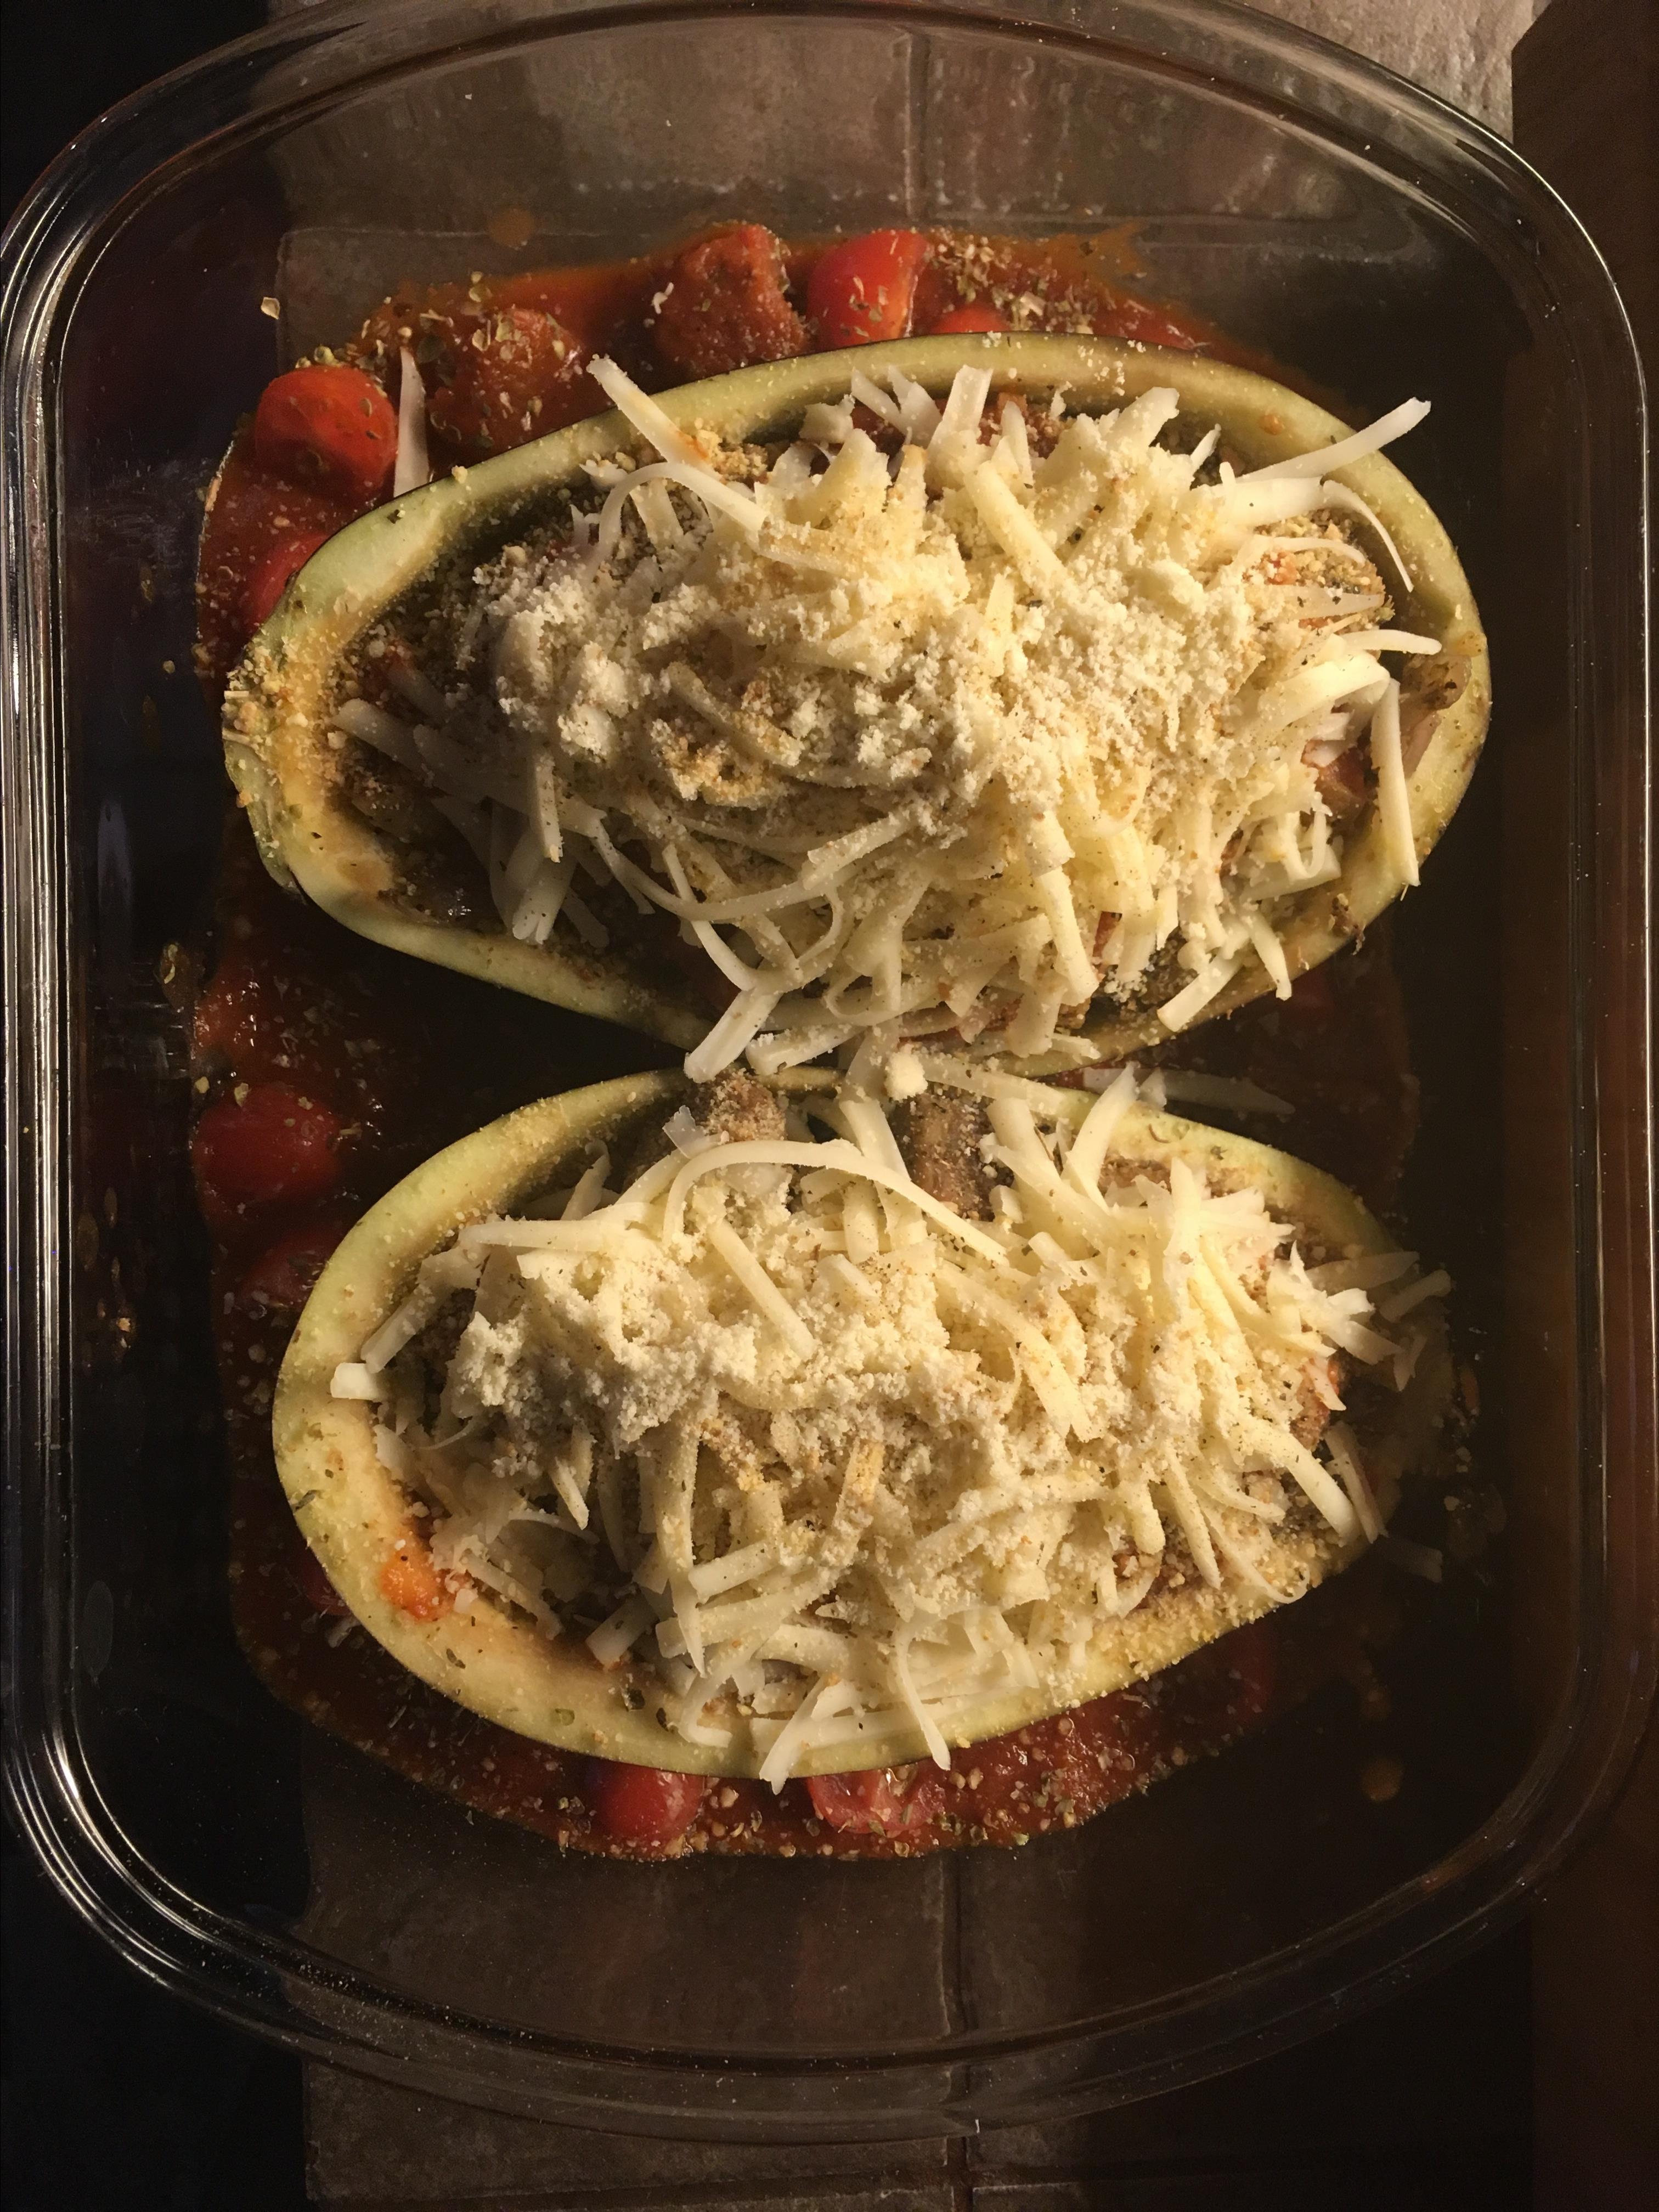 Stuffed Eggplant Parmesan Hannah Jane Hensely